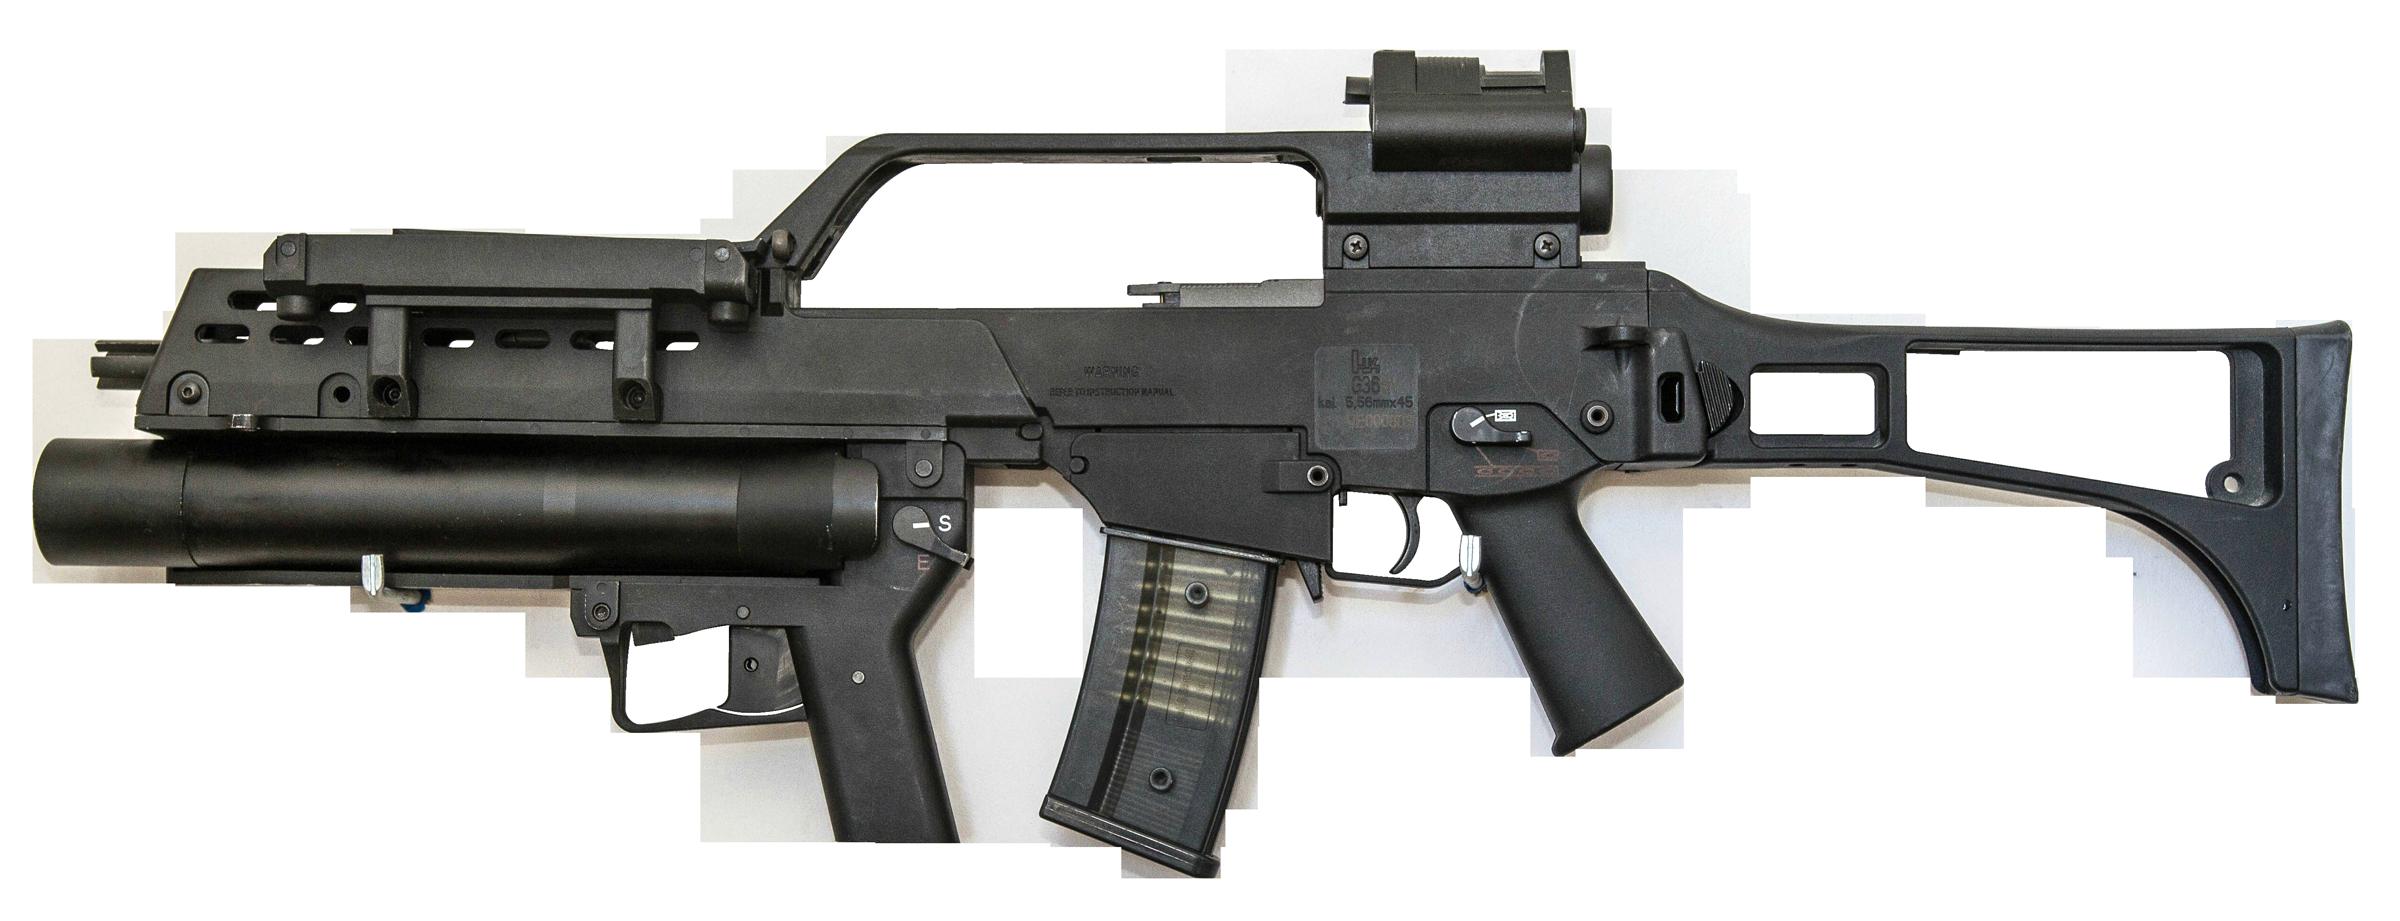 Grenade Launcher Gun PNG Image